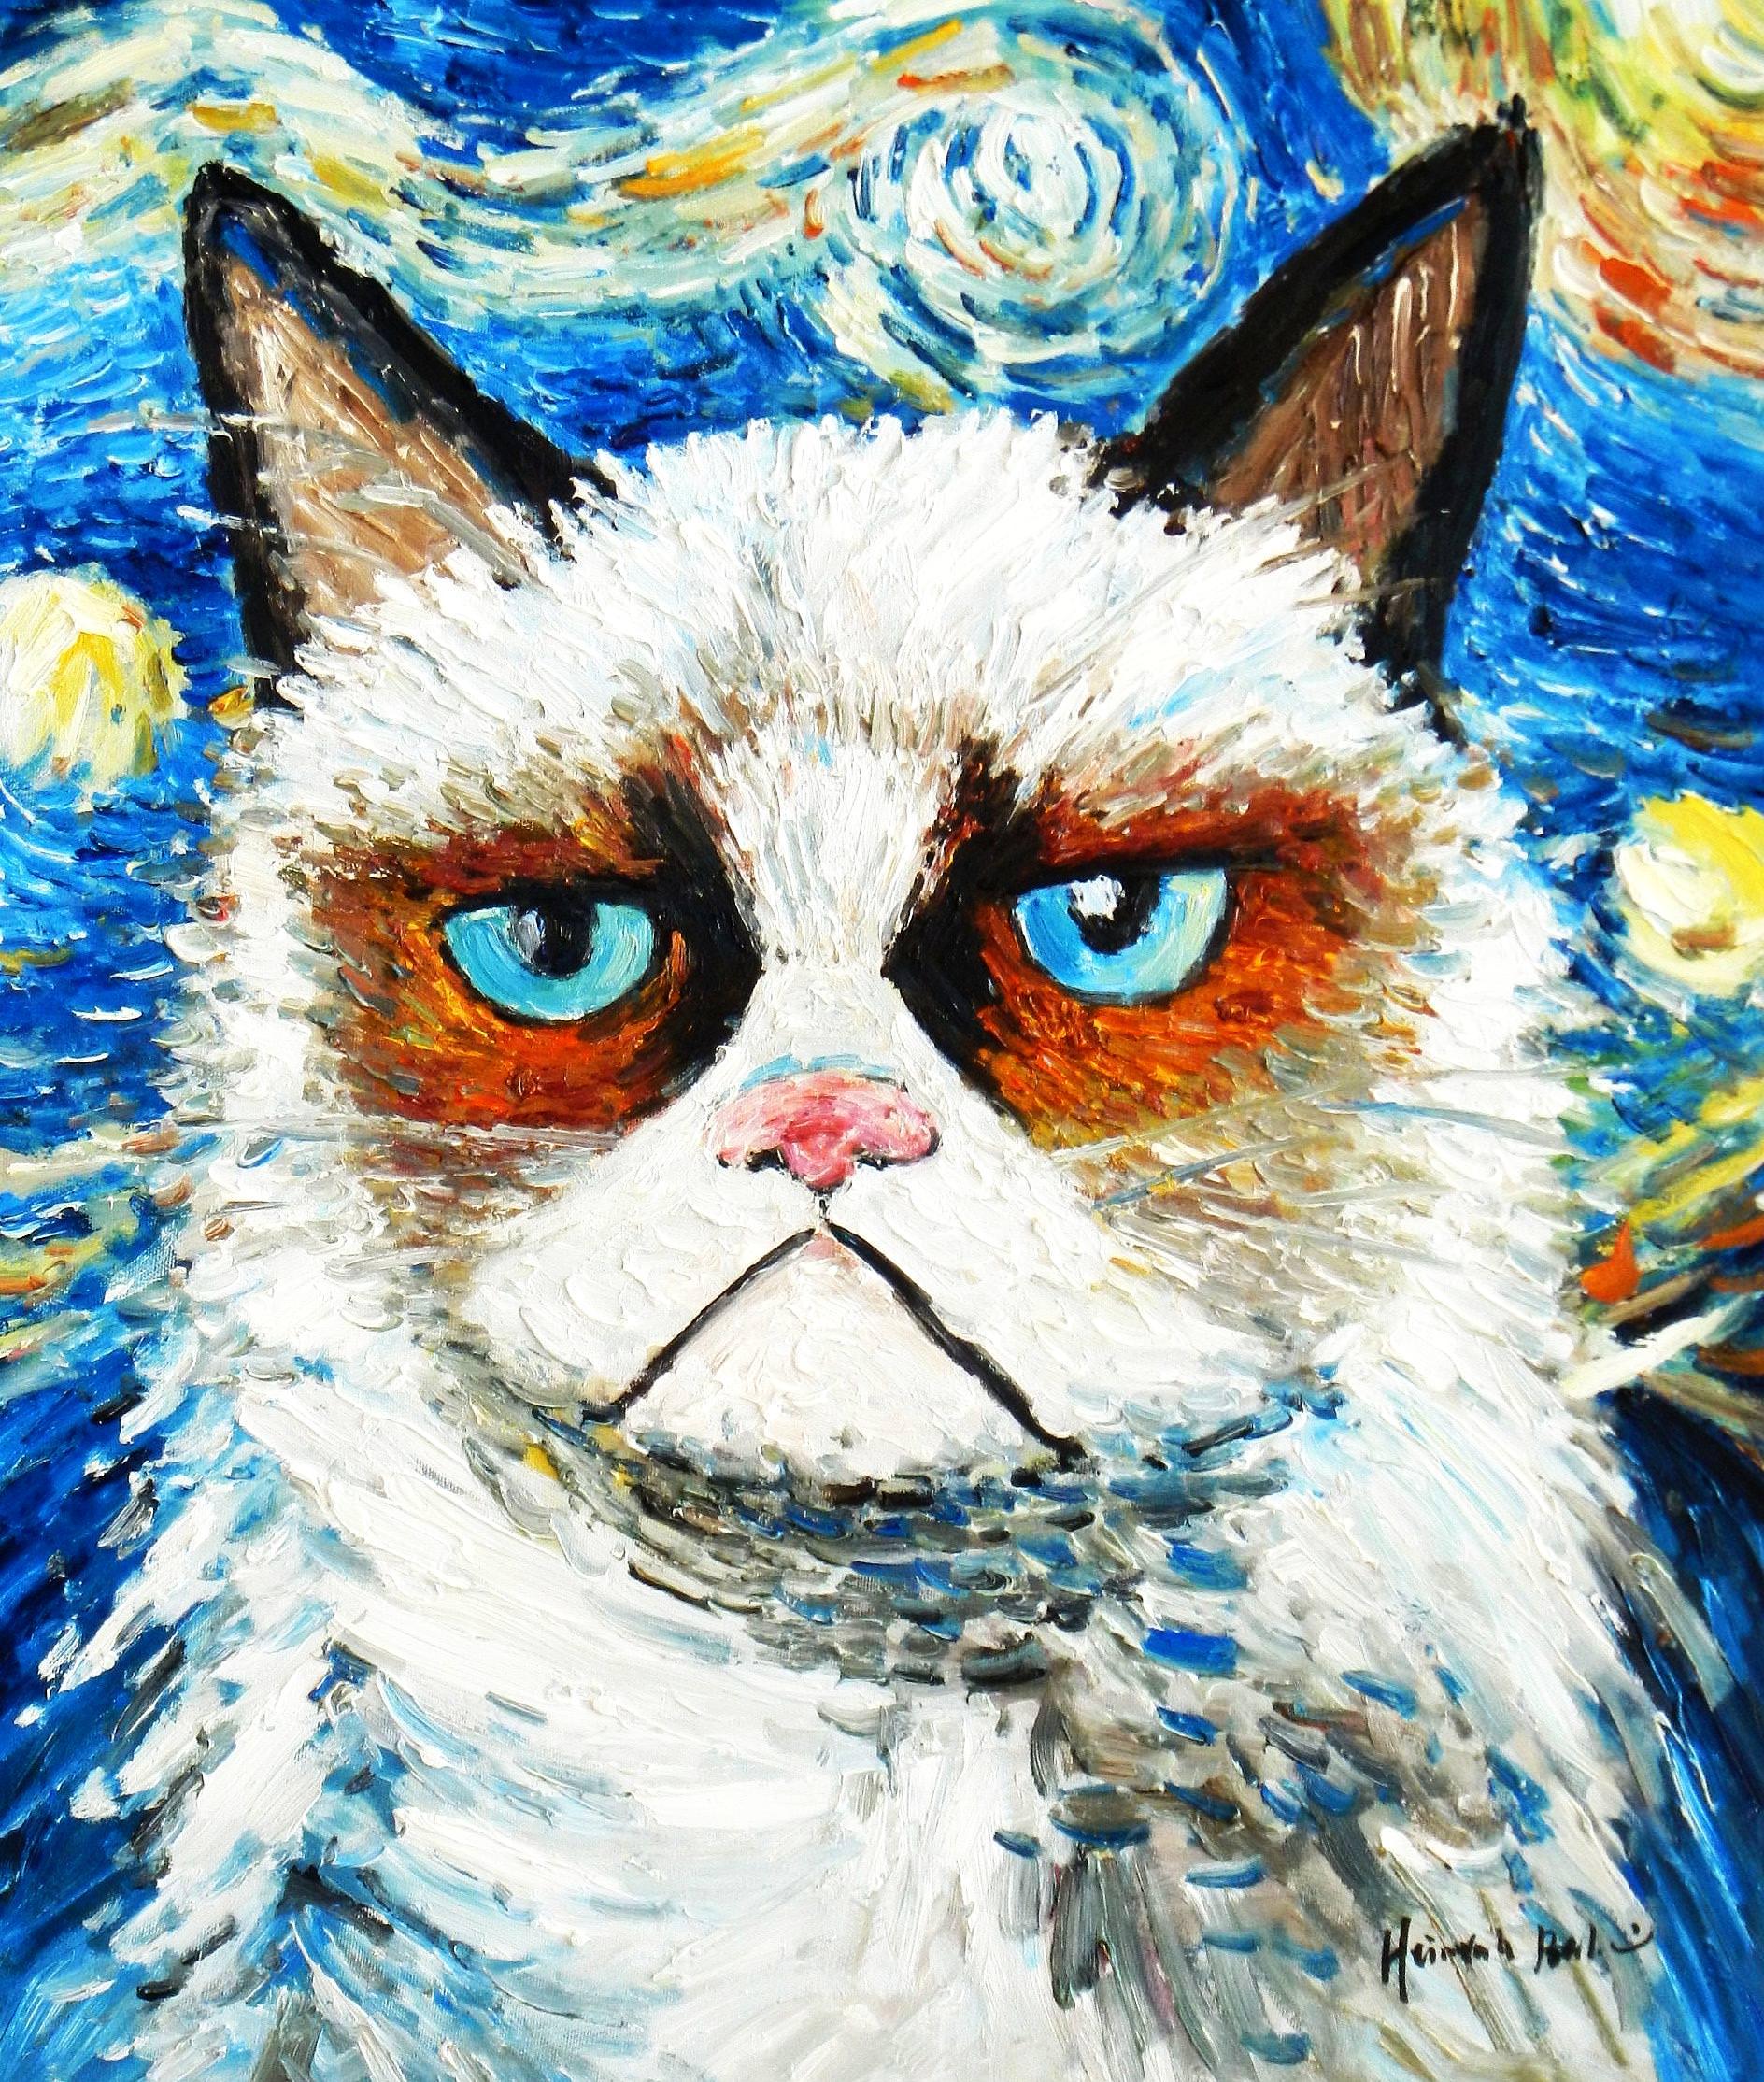 Modern Art - Grumpy cat meets Van Gogh c93273 50x60cm exquisites Ölgemälde